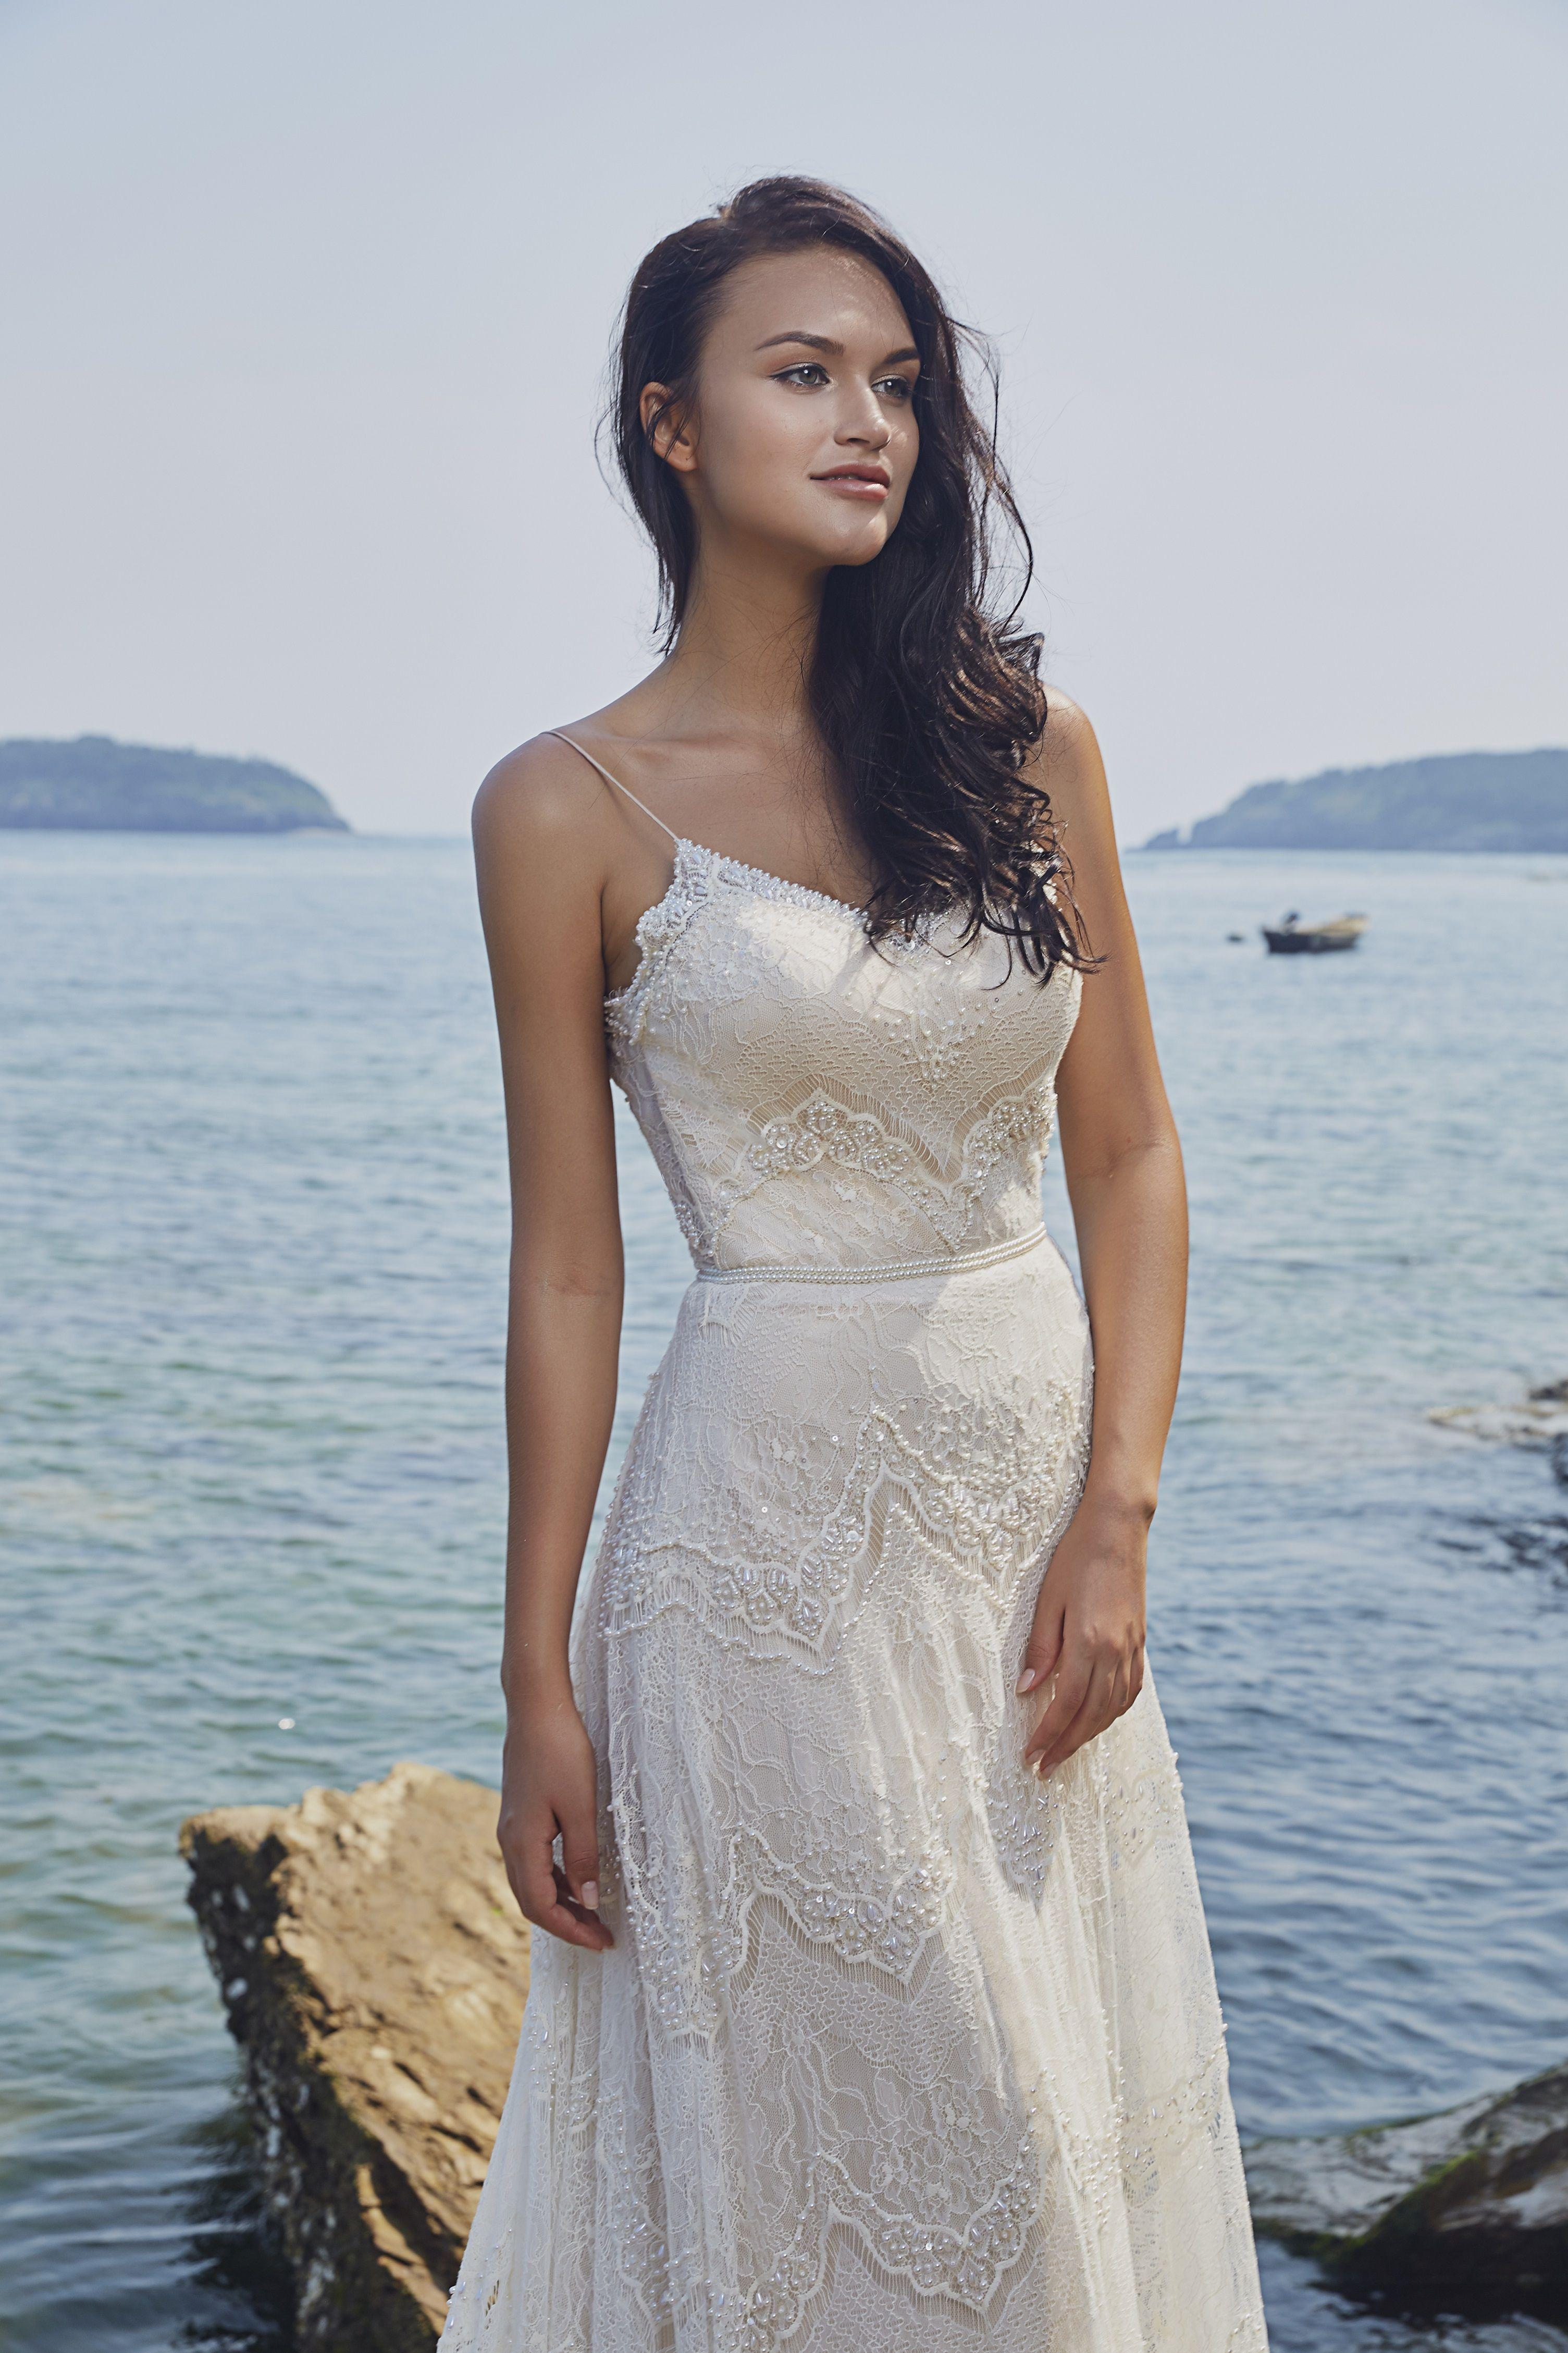 Pin by Ravish Bridal on Ravish Bridal Gowns | Pinterest | Bridal ...